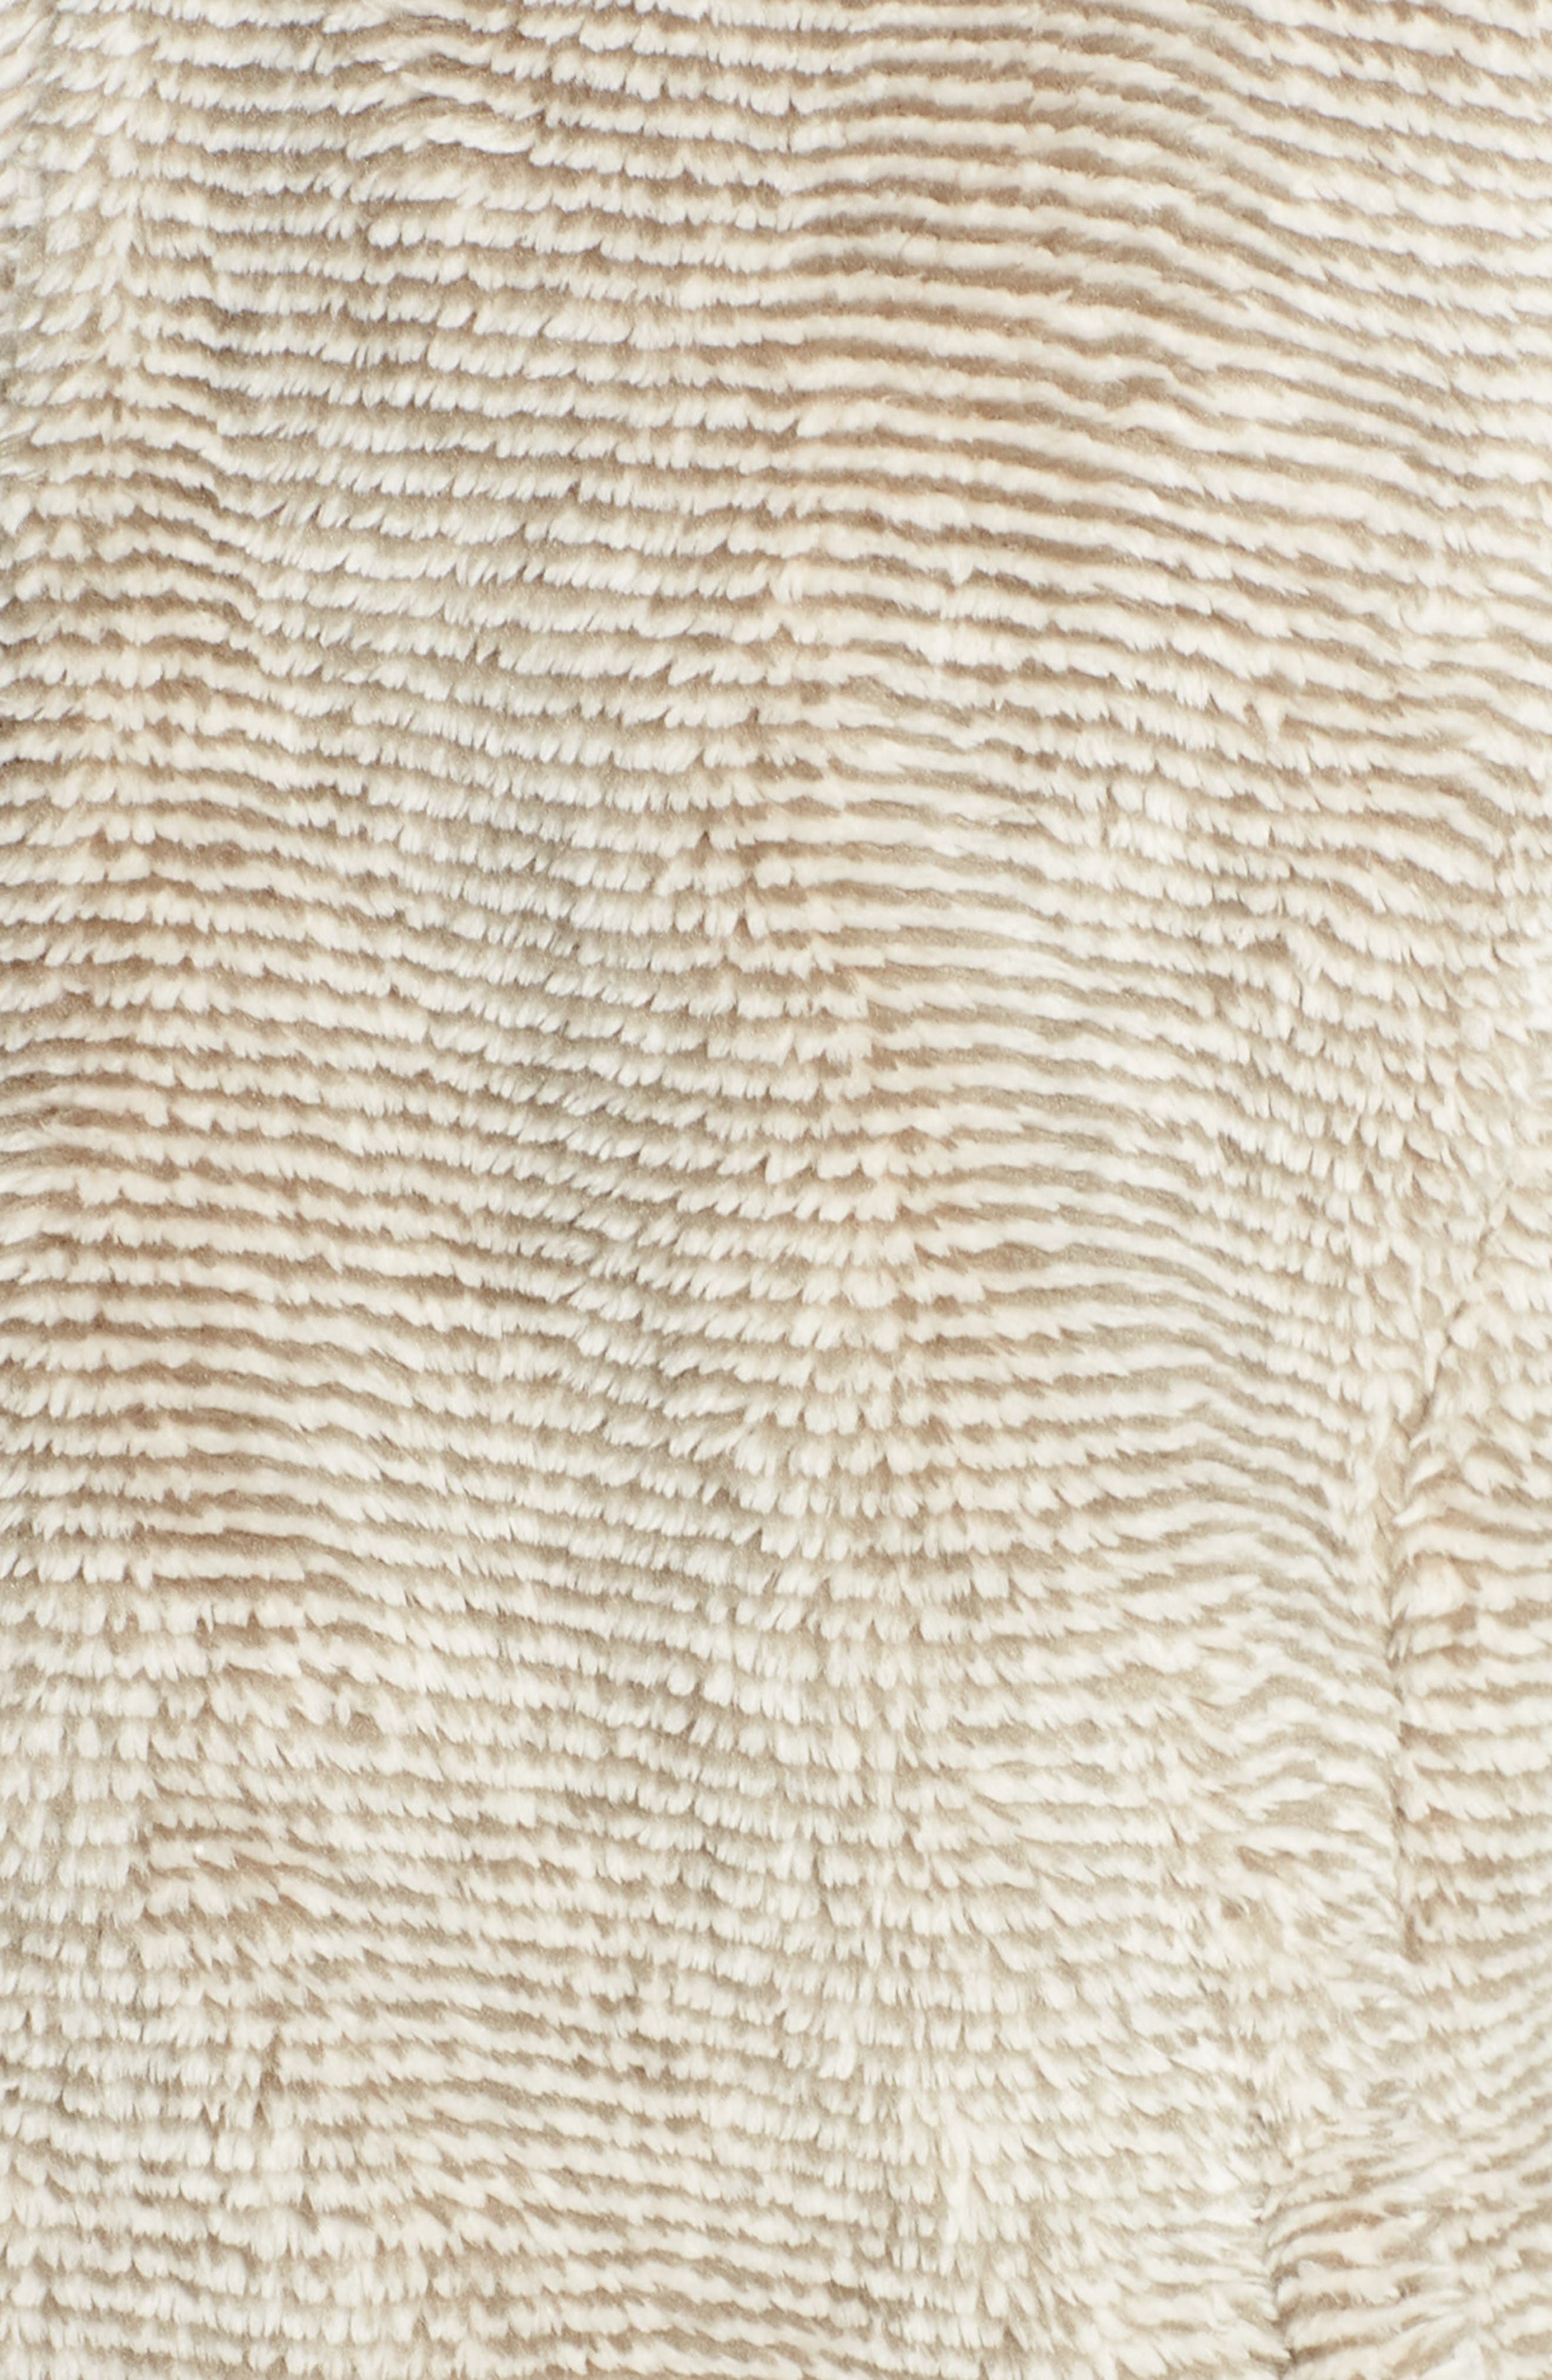 THE NORTH FACE, Osito 2 Stripe Fleece Jacket, Alternate thumbnail 7, color, GREY/ VINTAGE WHITE STRIPE